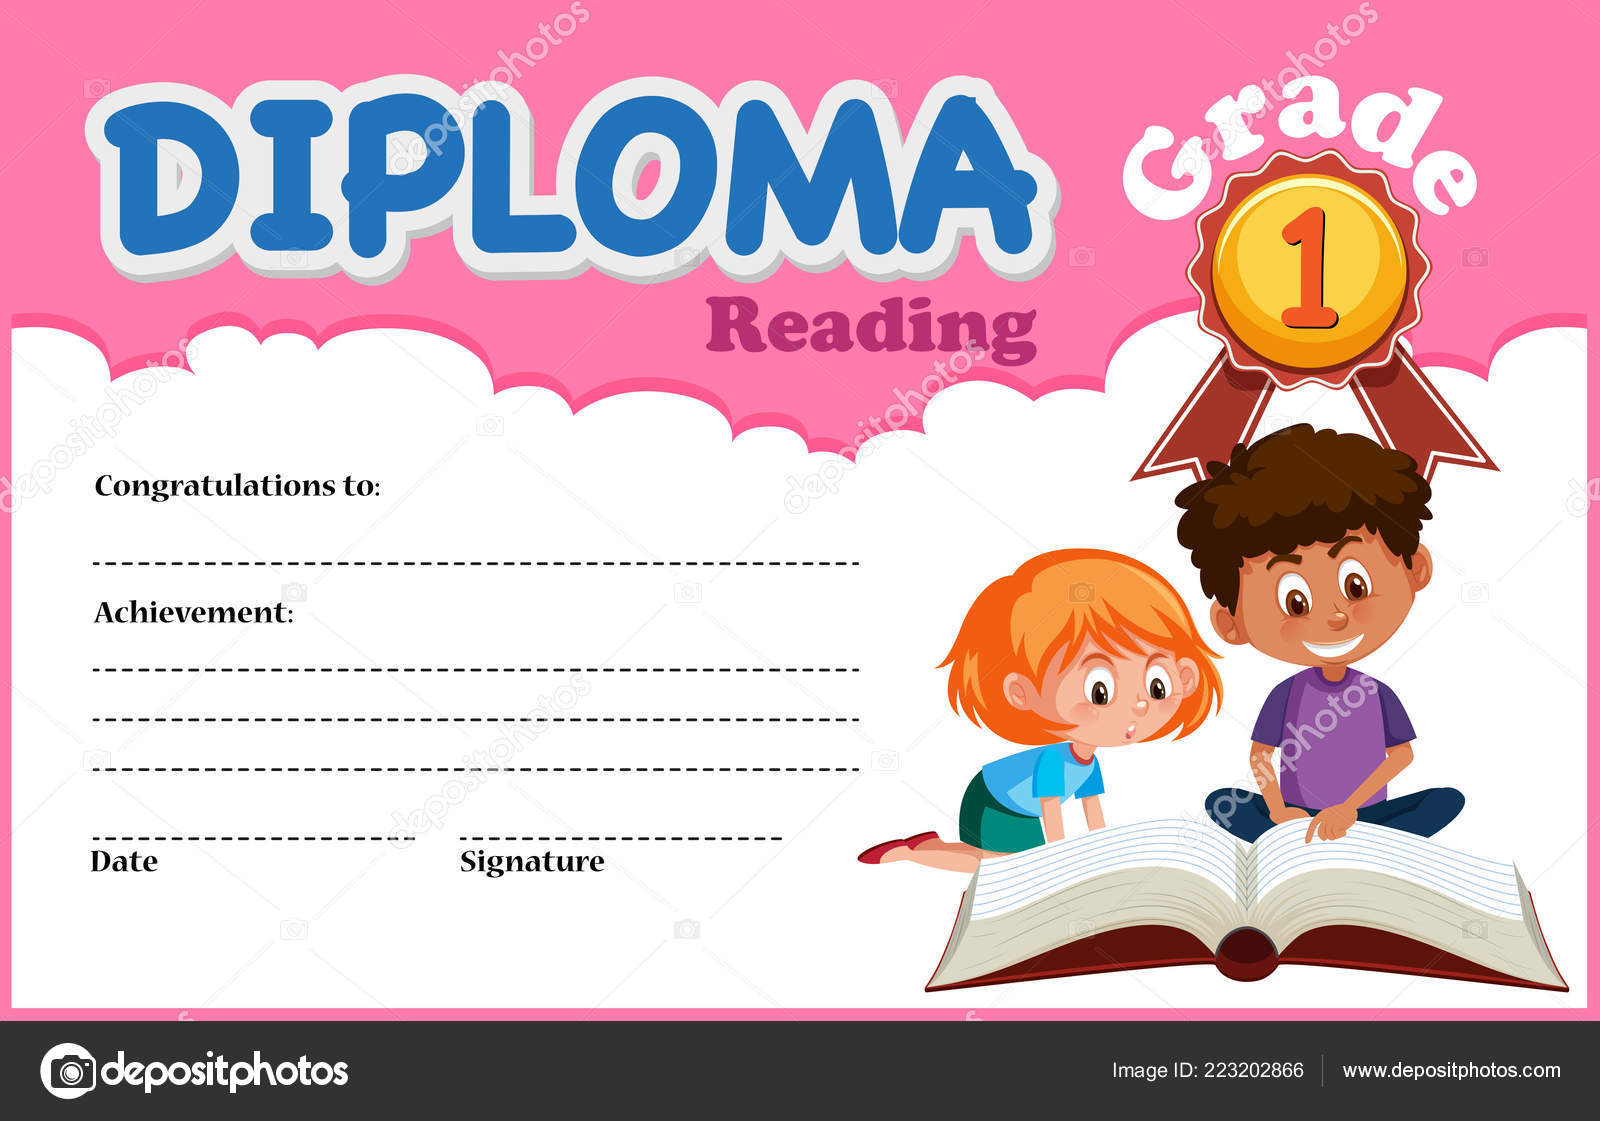 Reading Deiploma Certificate Template Illustration Stock Vector